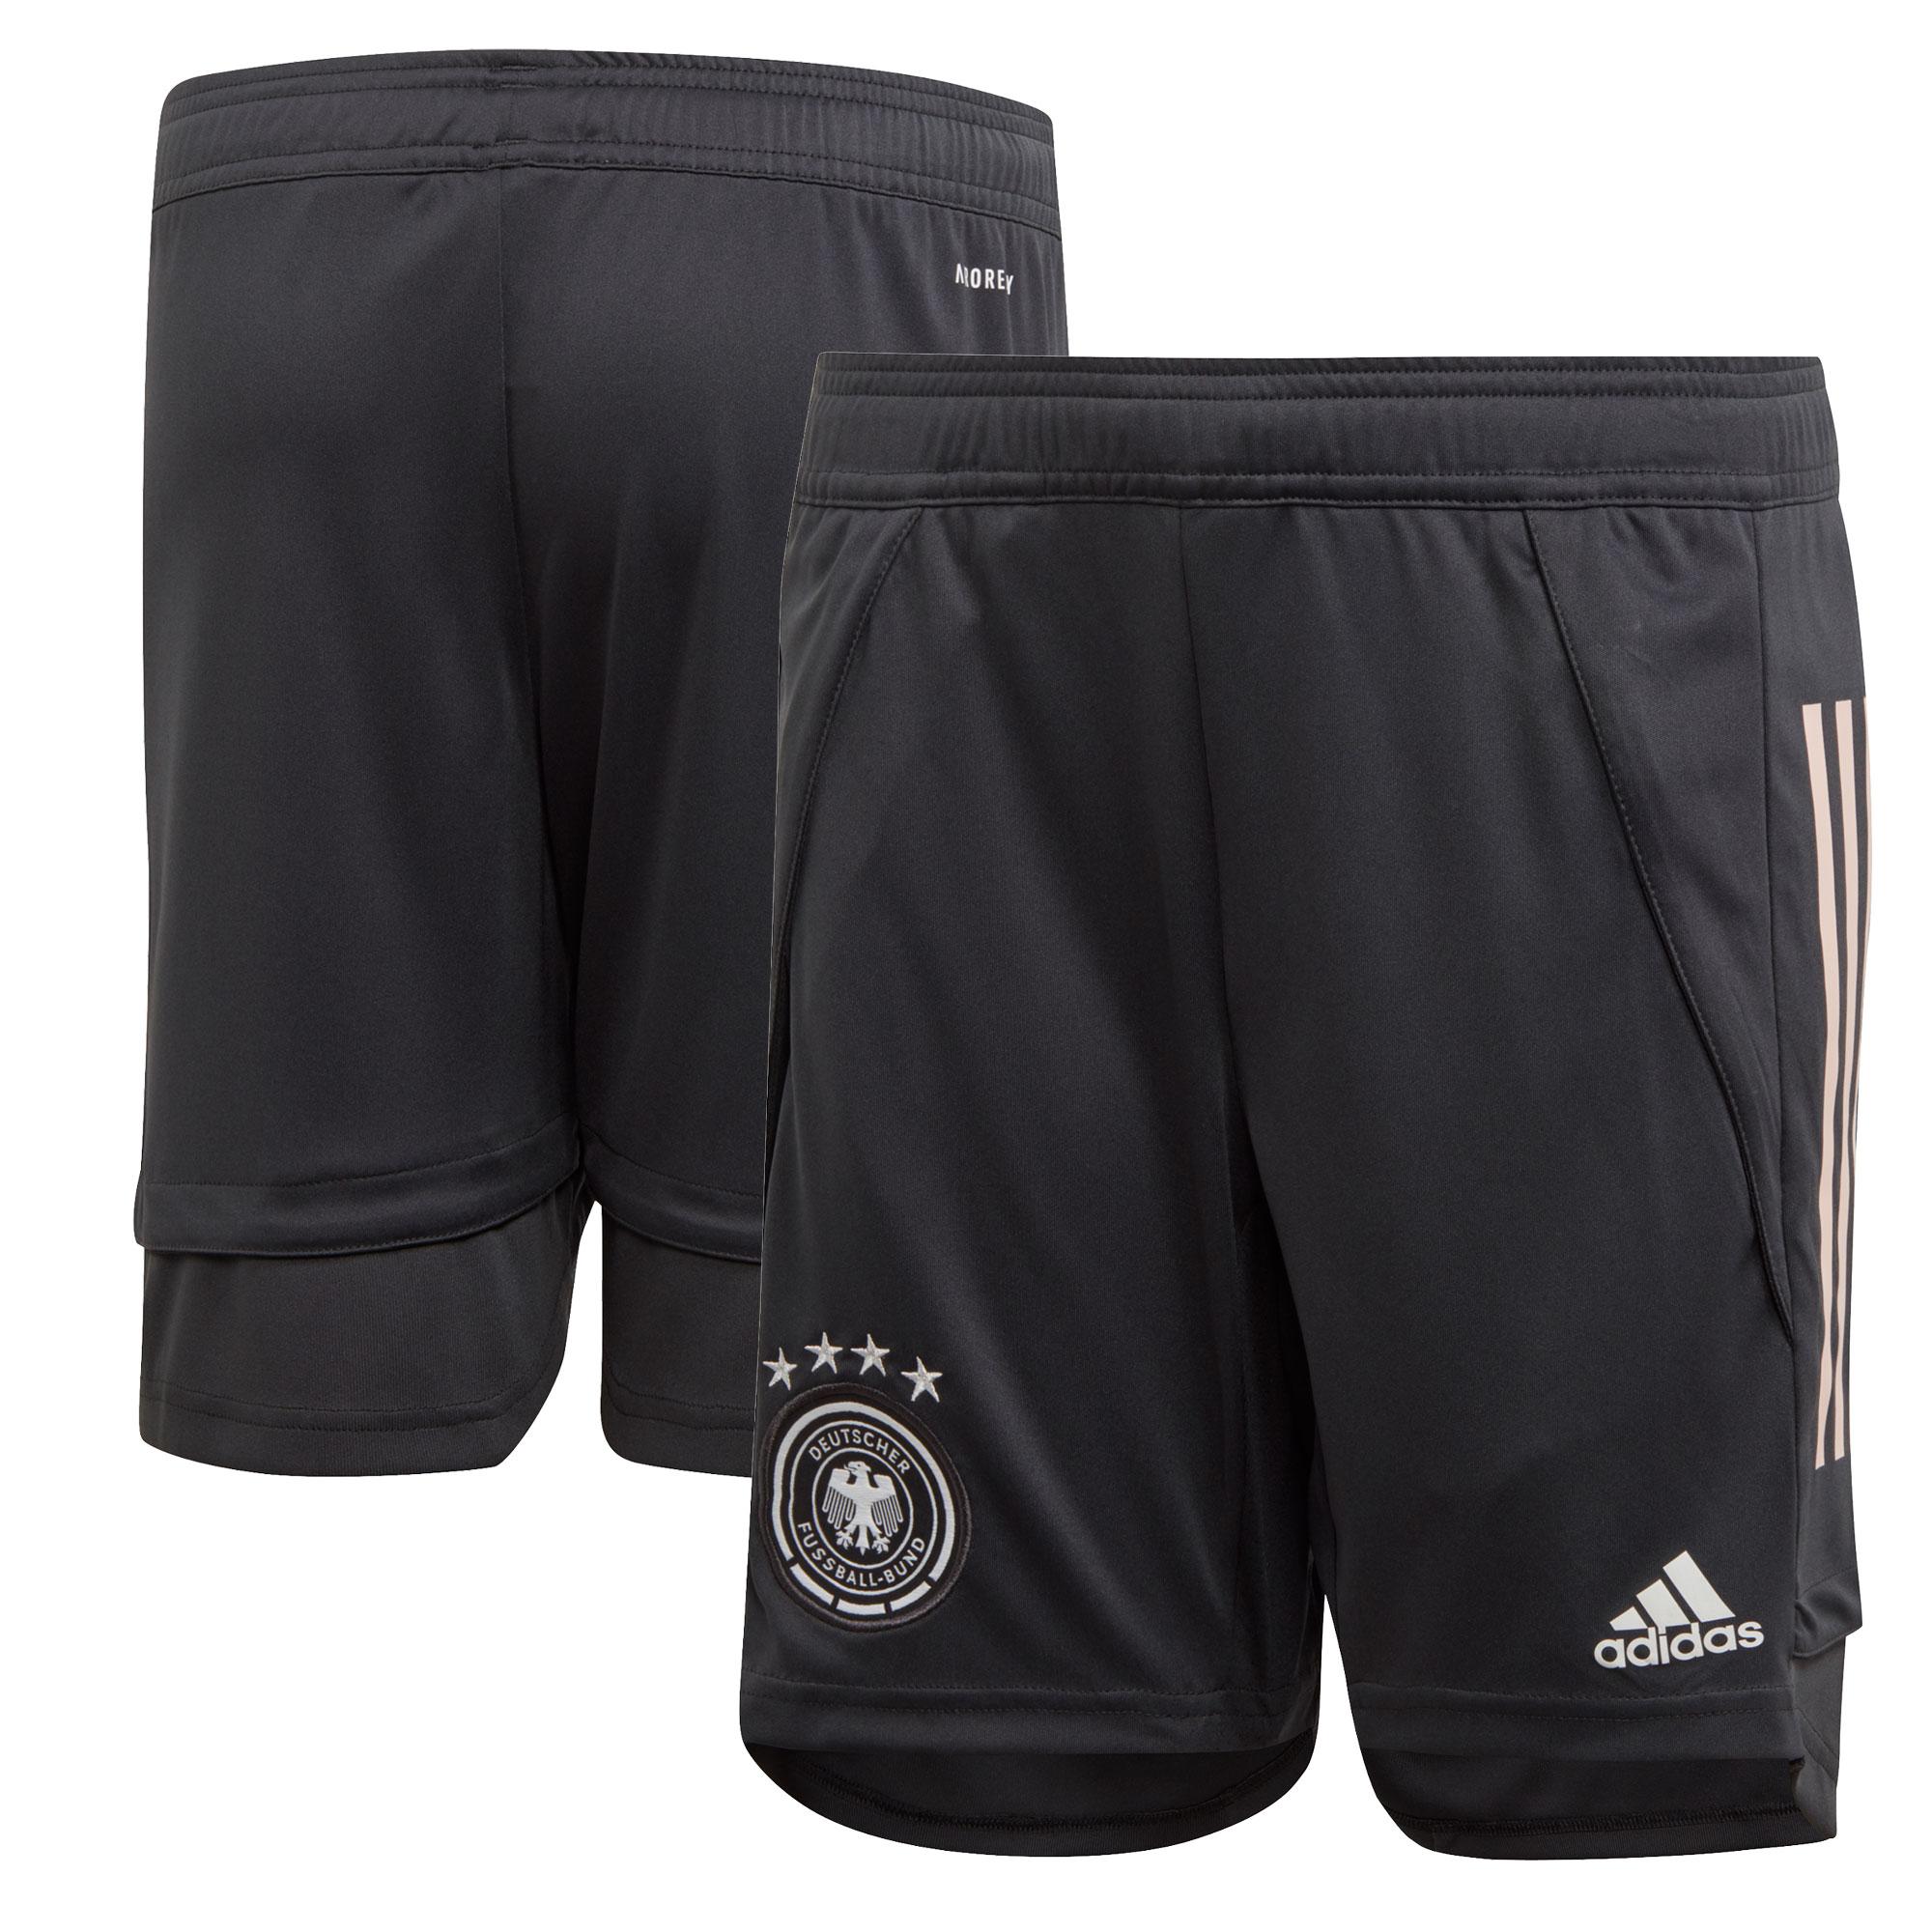 Germany Training Shorts - Dk Grey - Kids